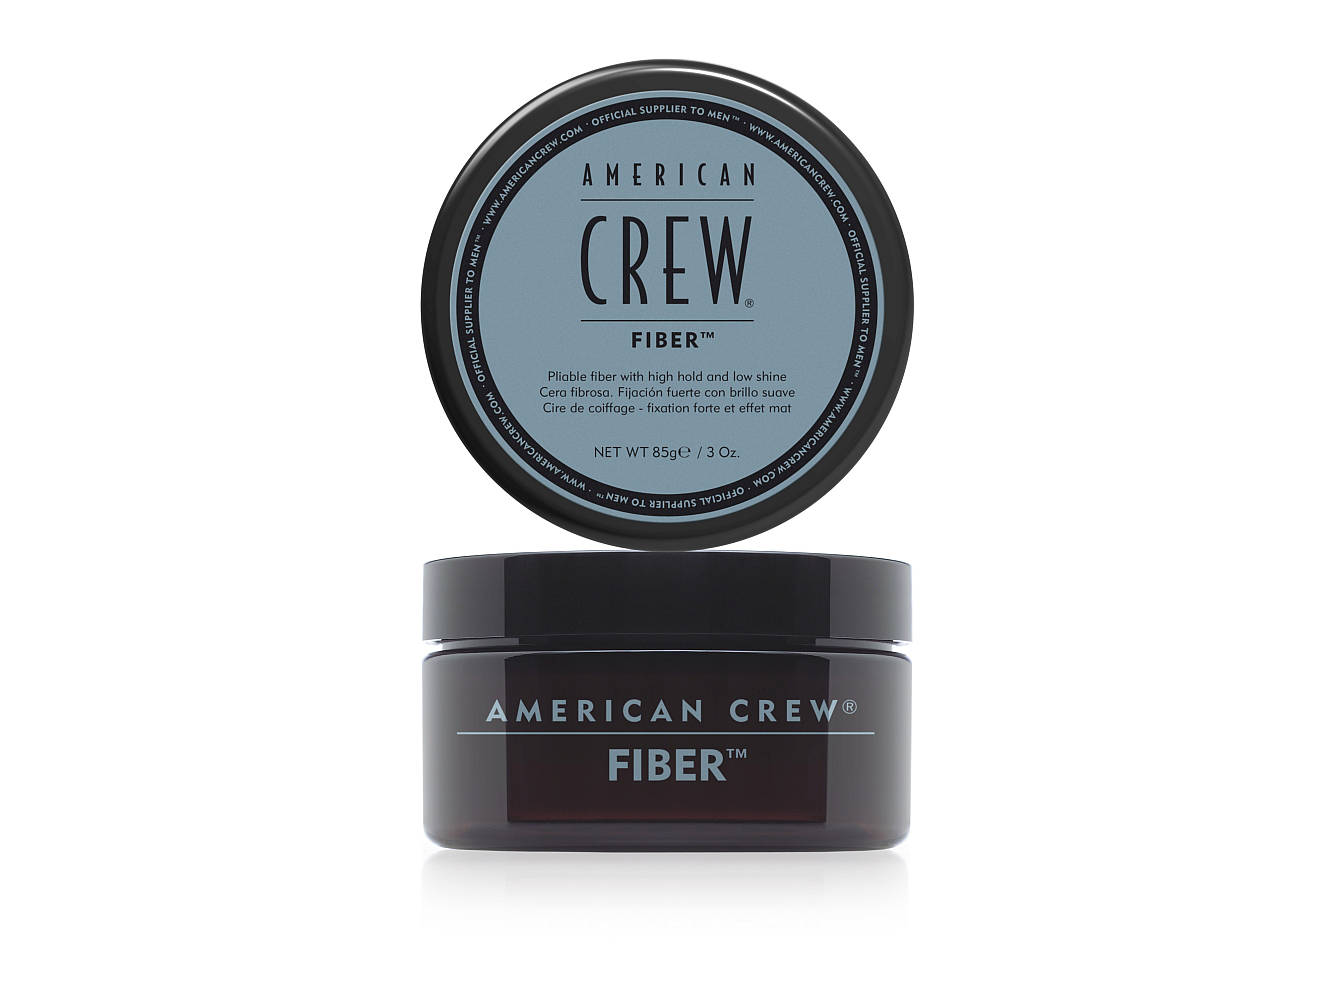 Arma Beauty - American Crew - Fiber